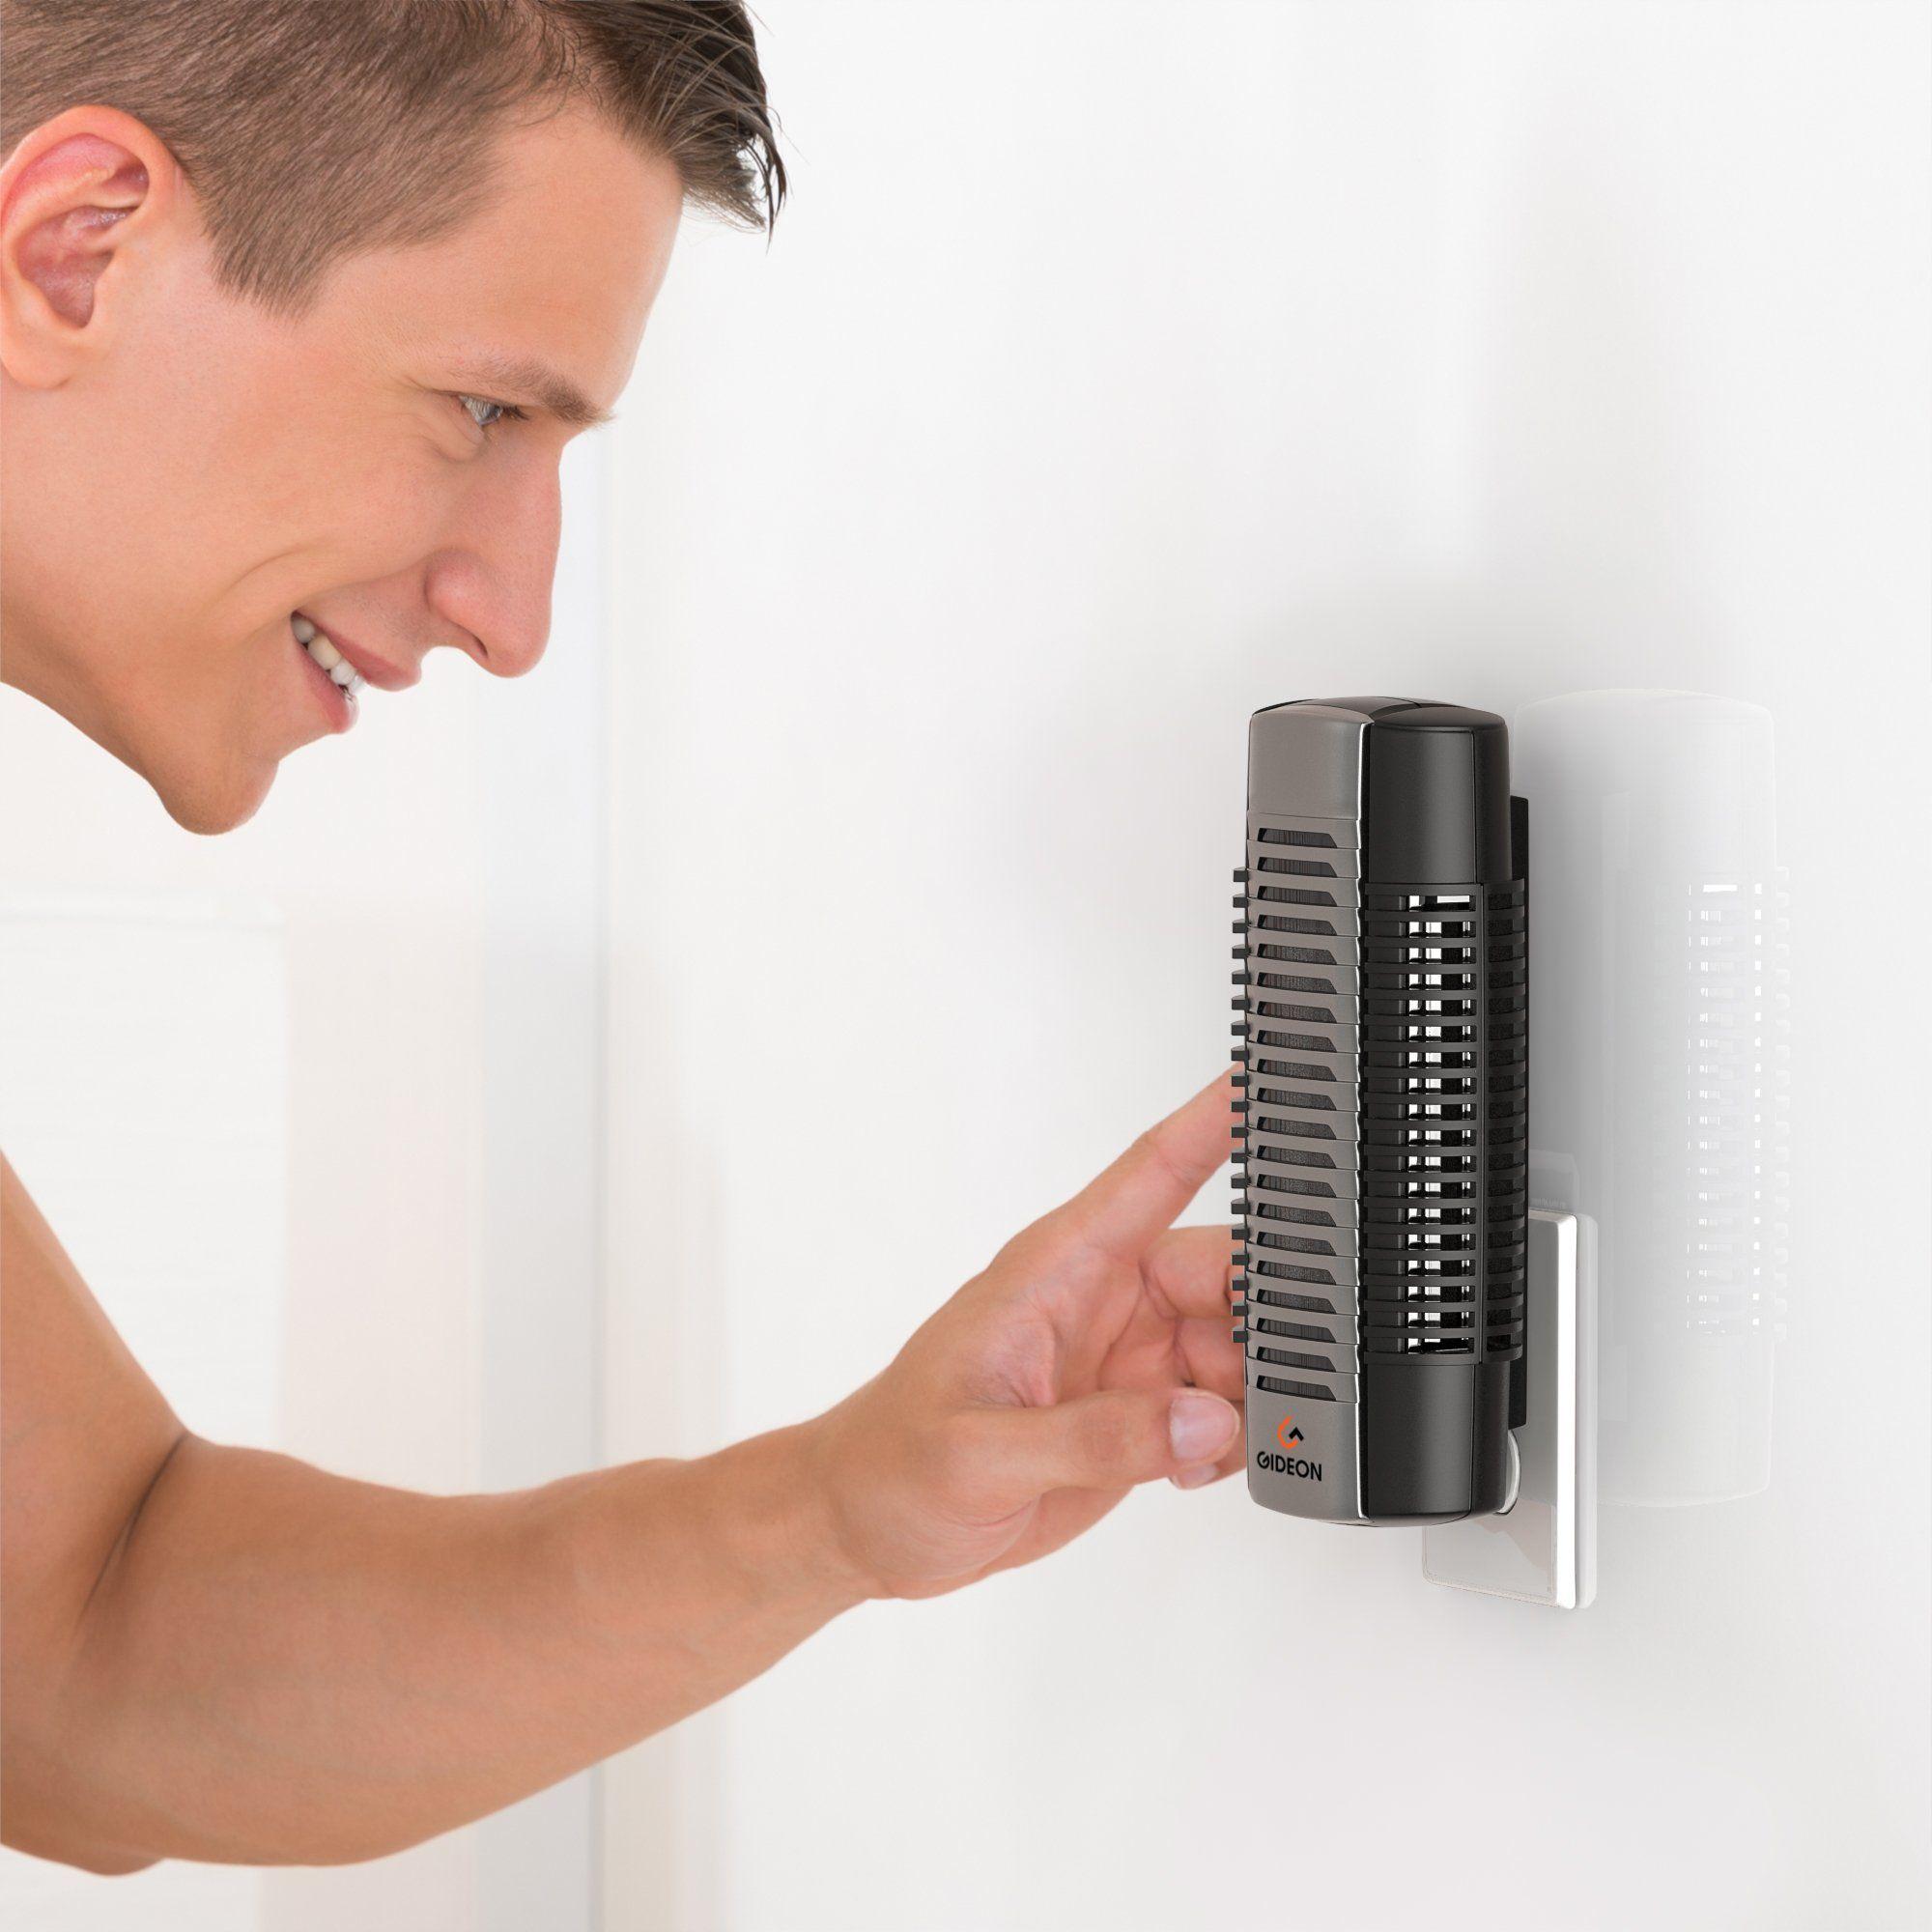 Gideon Electronic Plugin Air Purifier with UV Air